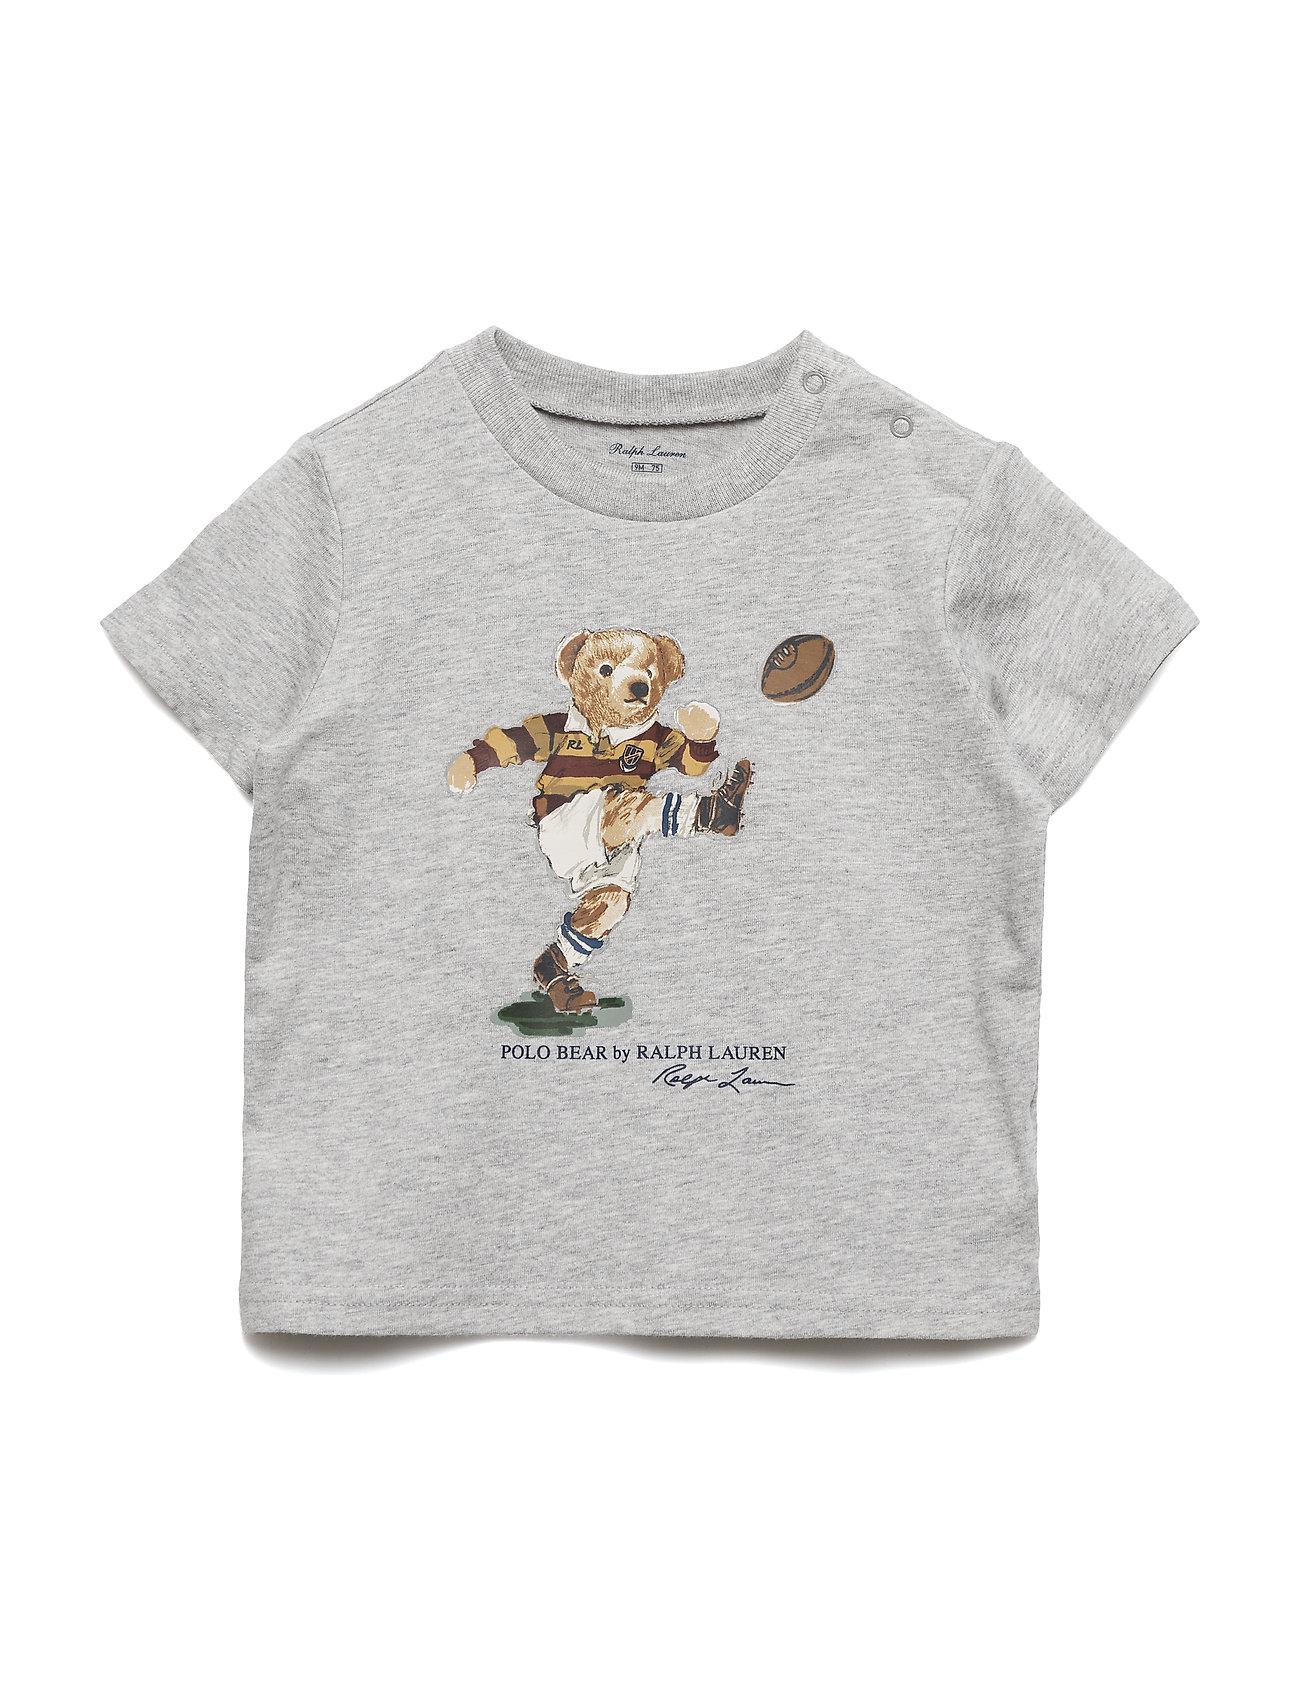 Ralph Lauren Baby Rugby Bear Cotton Jersey Tee - LT GREY